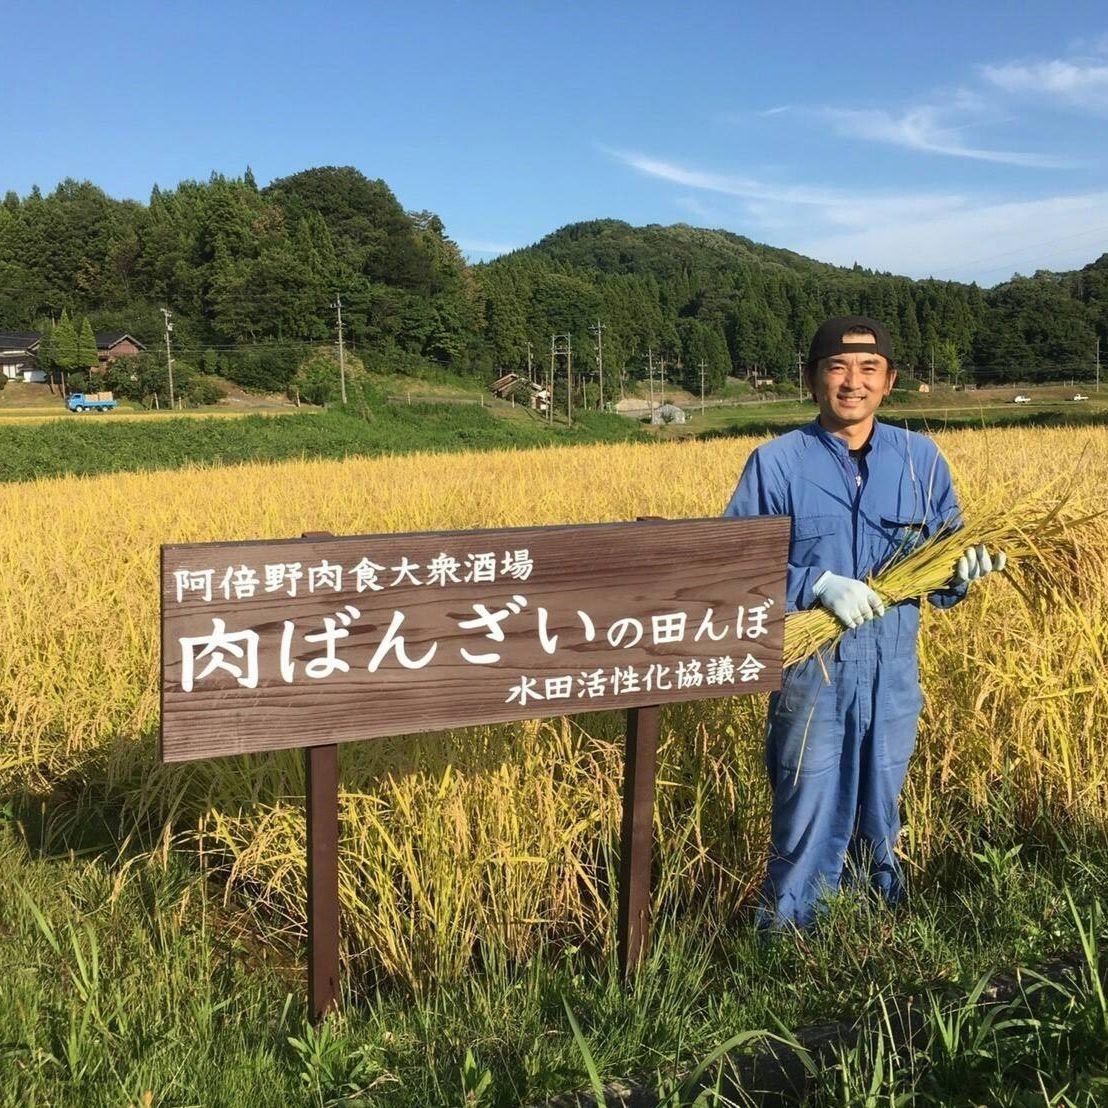 Nobuaki Kawahara